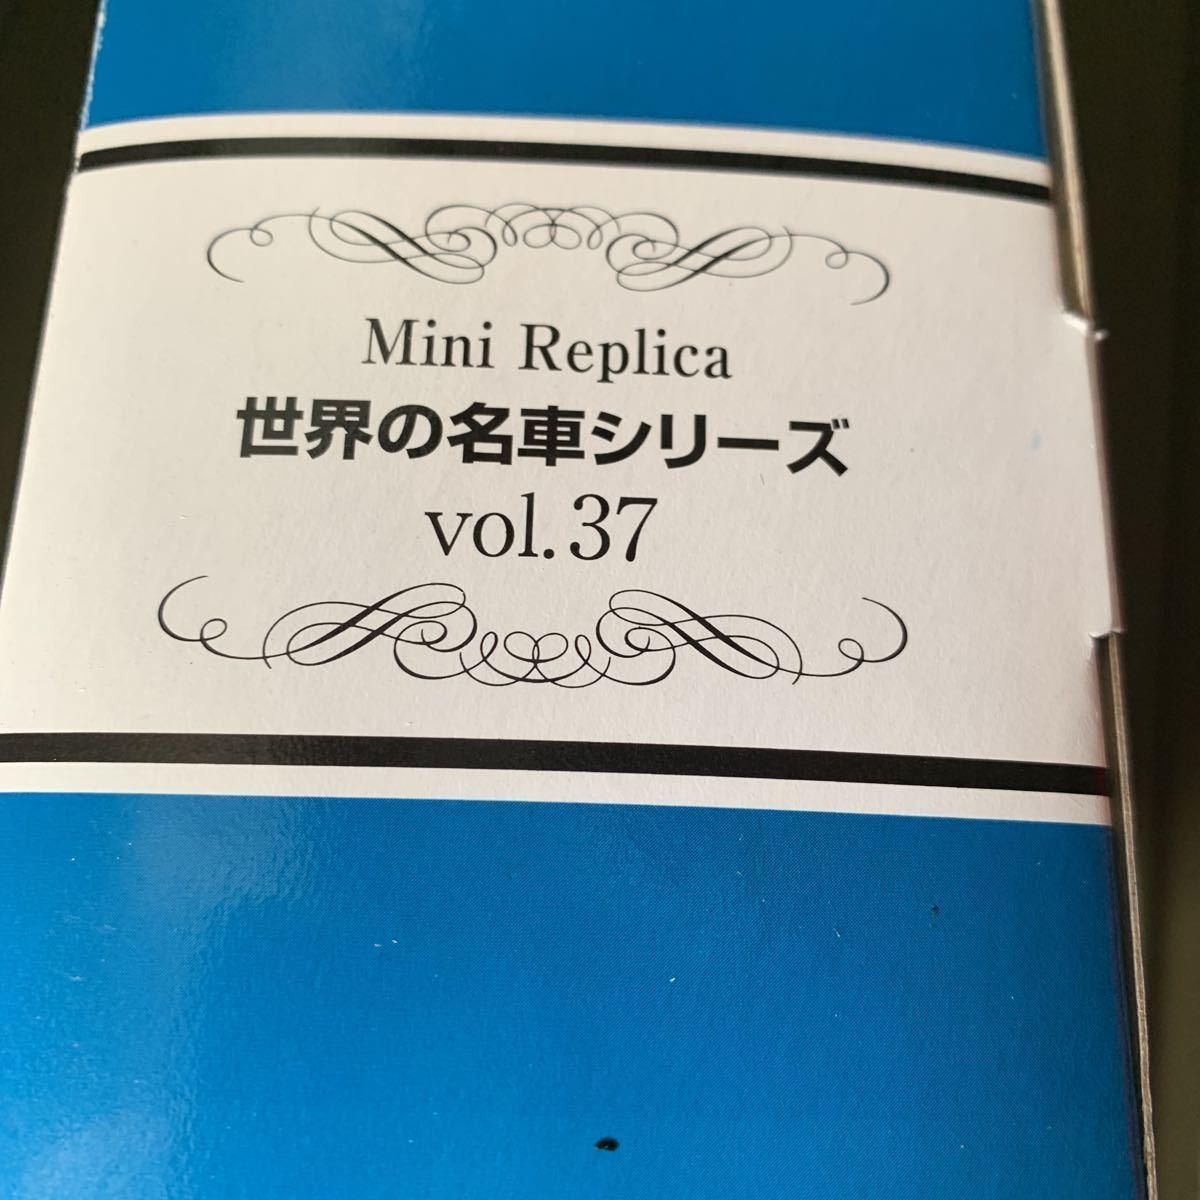 K_DSC0054 世界の名車シリーズ vol.37 SUZUKI GT380 レッドバロン ミニレプリカ バイクのインテリアミニカー_画像10